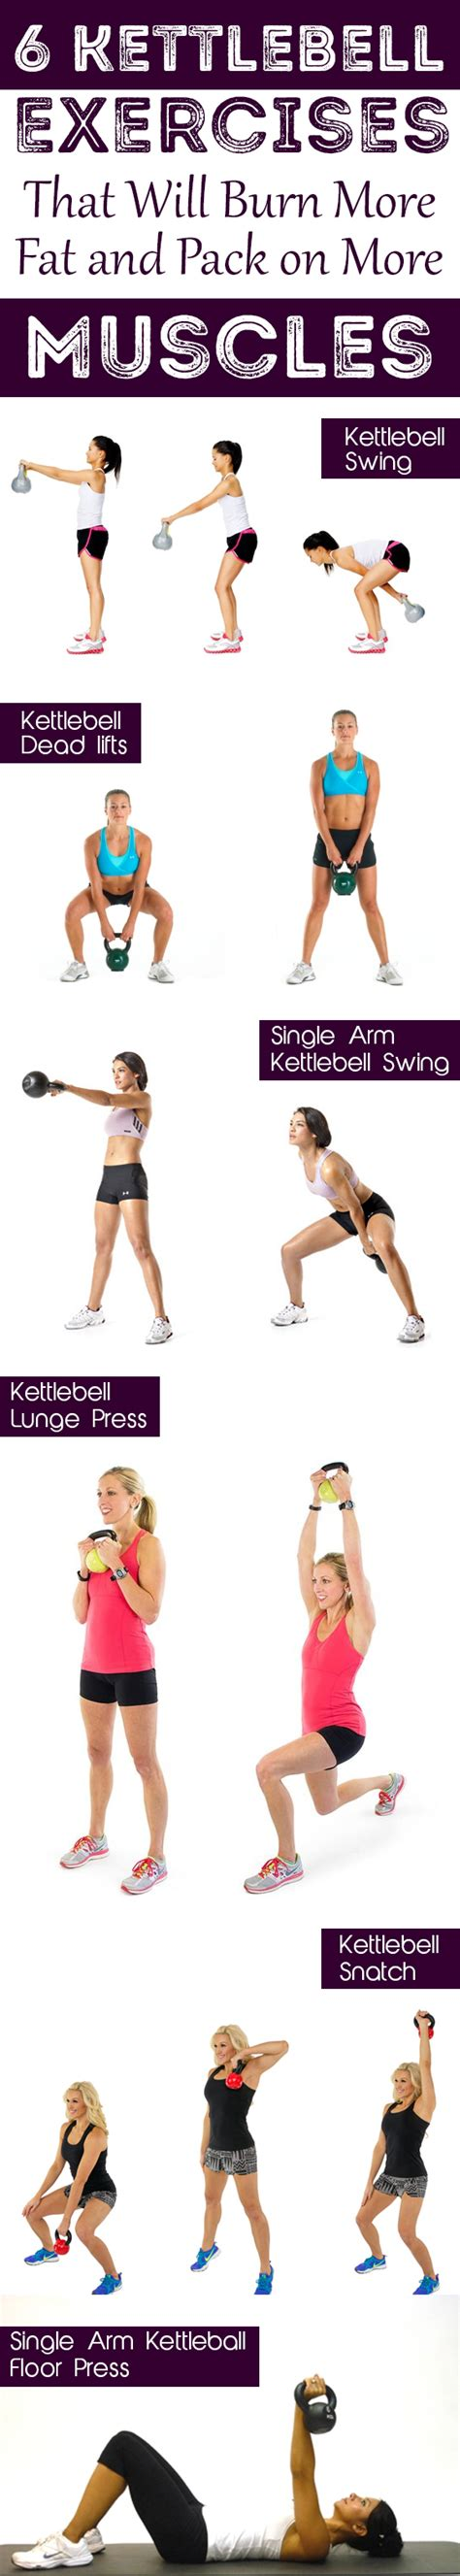 kettlebell exercises muscles fat pack burn